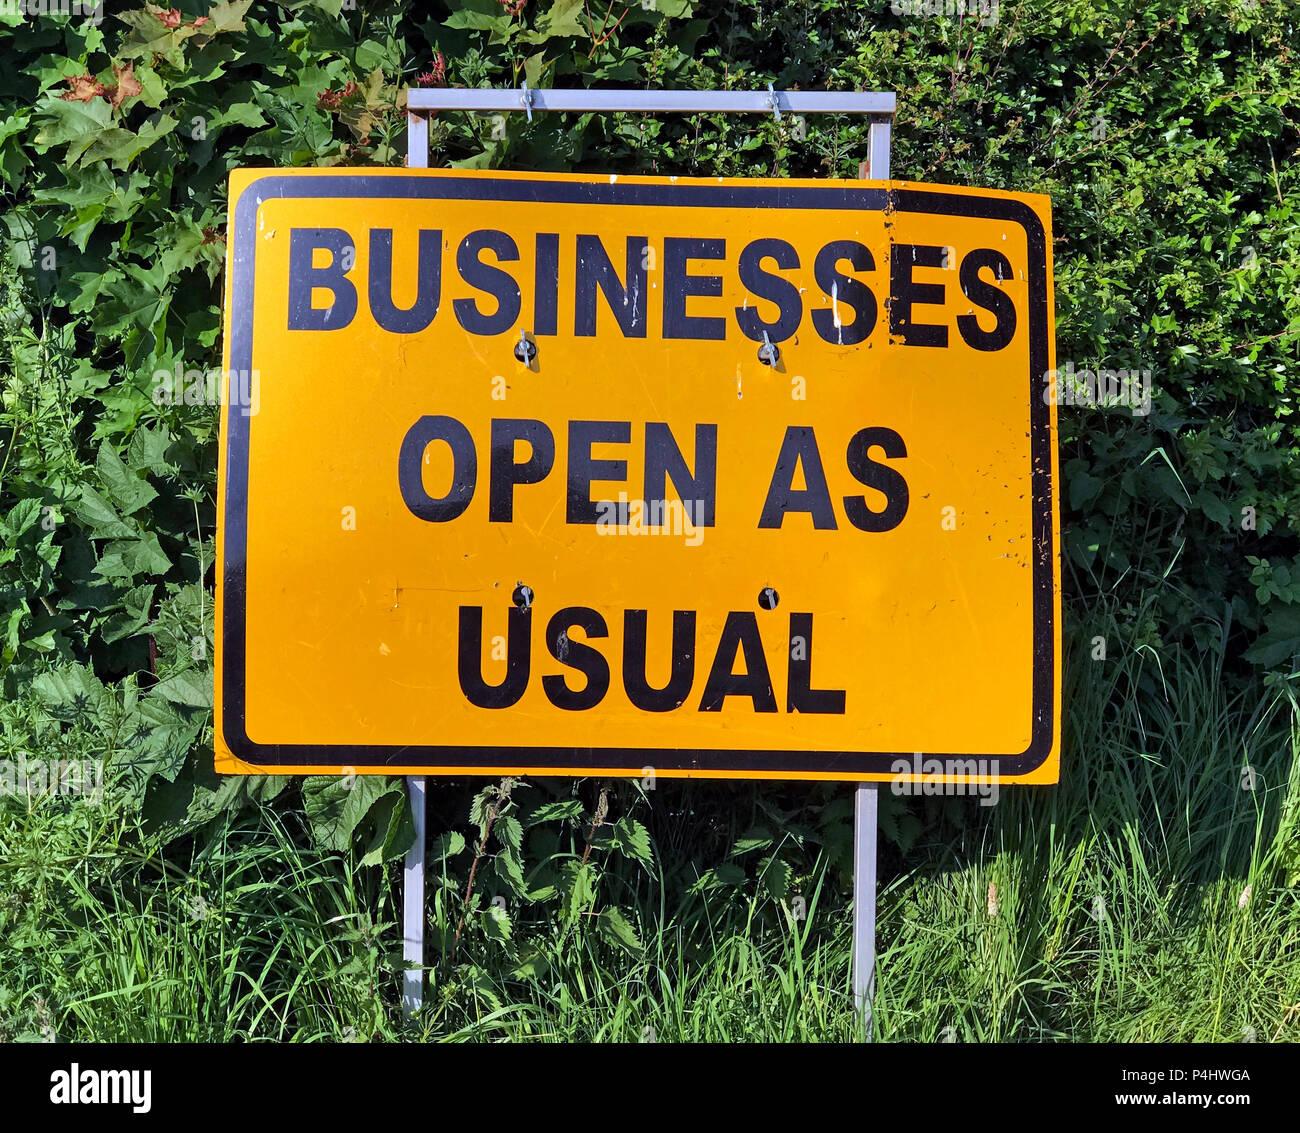 GoTonySmith,@HotpixUK,HotpixUK,Businesses Open as usual sign,Businesses Open,as usual,sign